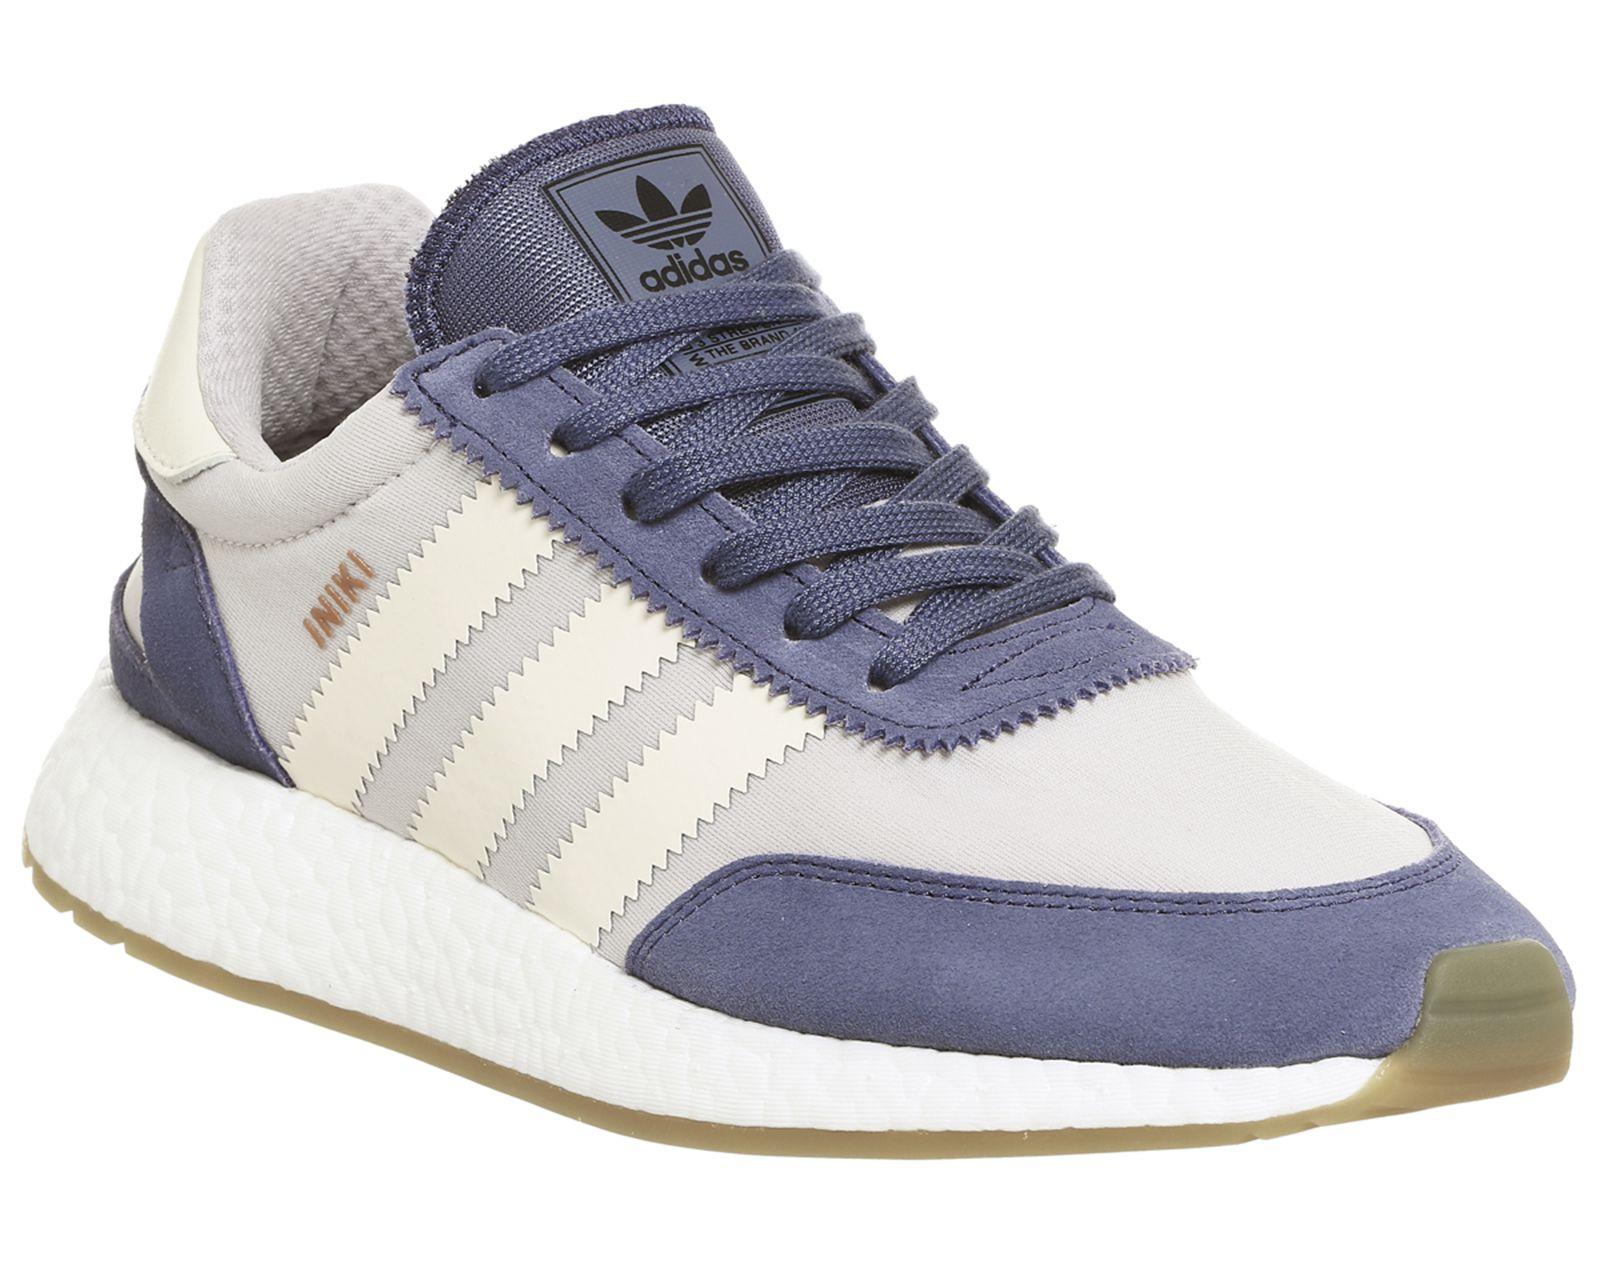 Adidas, iniki runner, super viola white cuori pinterest